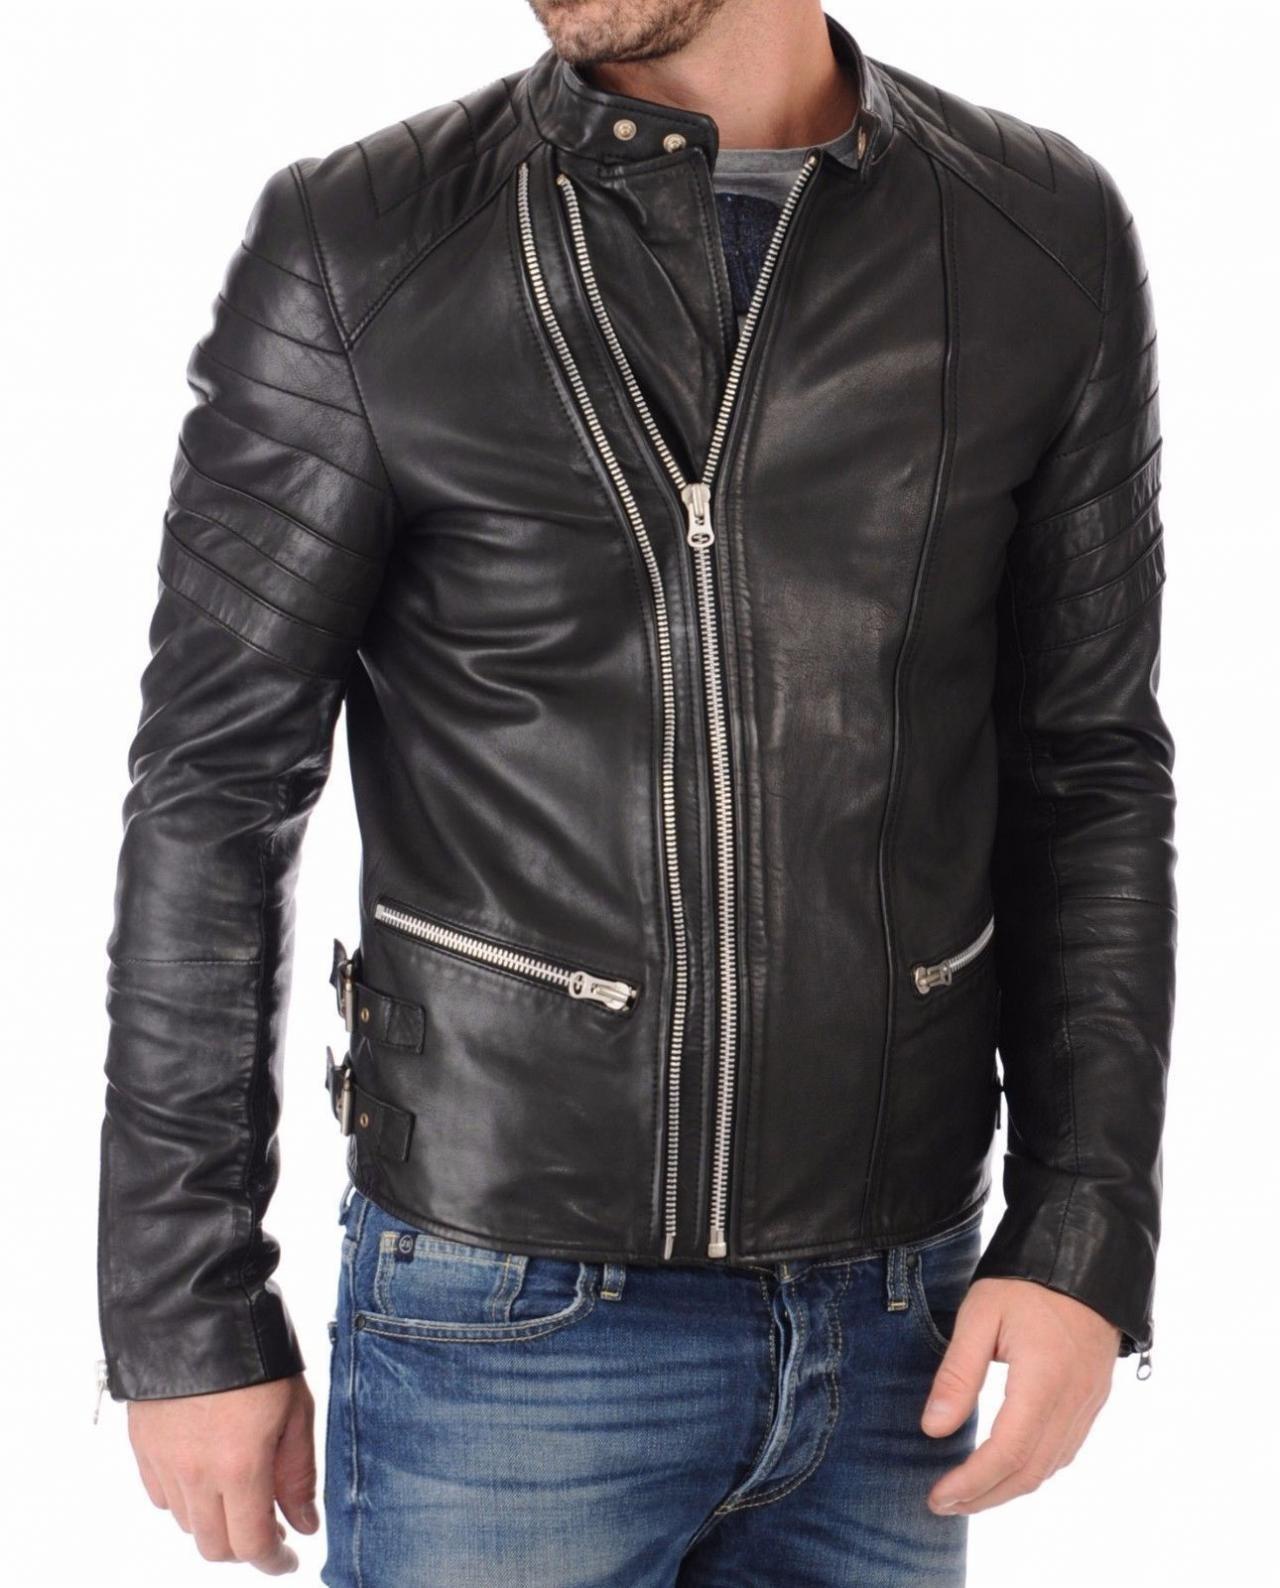 Men Leather Jacket Handmade Black Motorcycle Solid